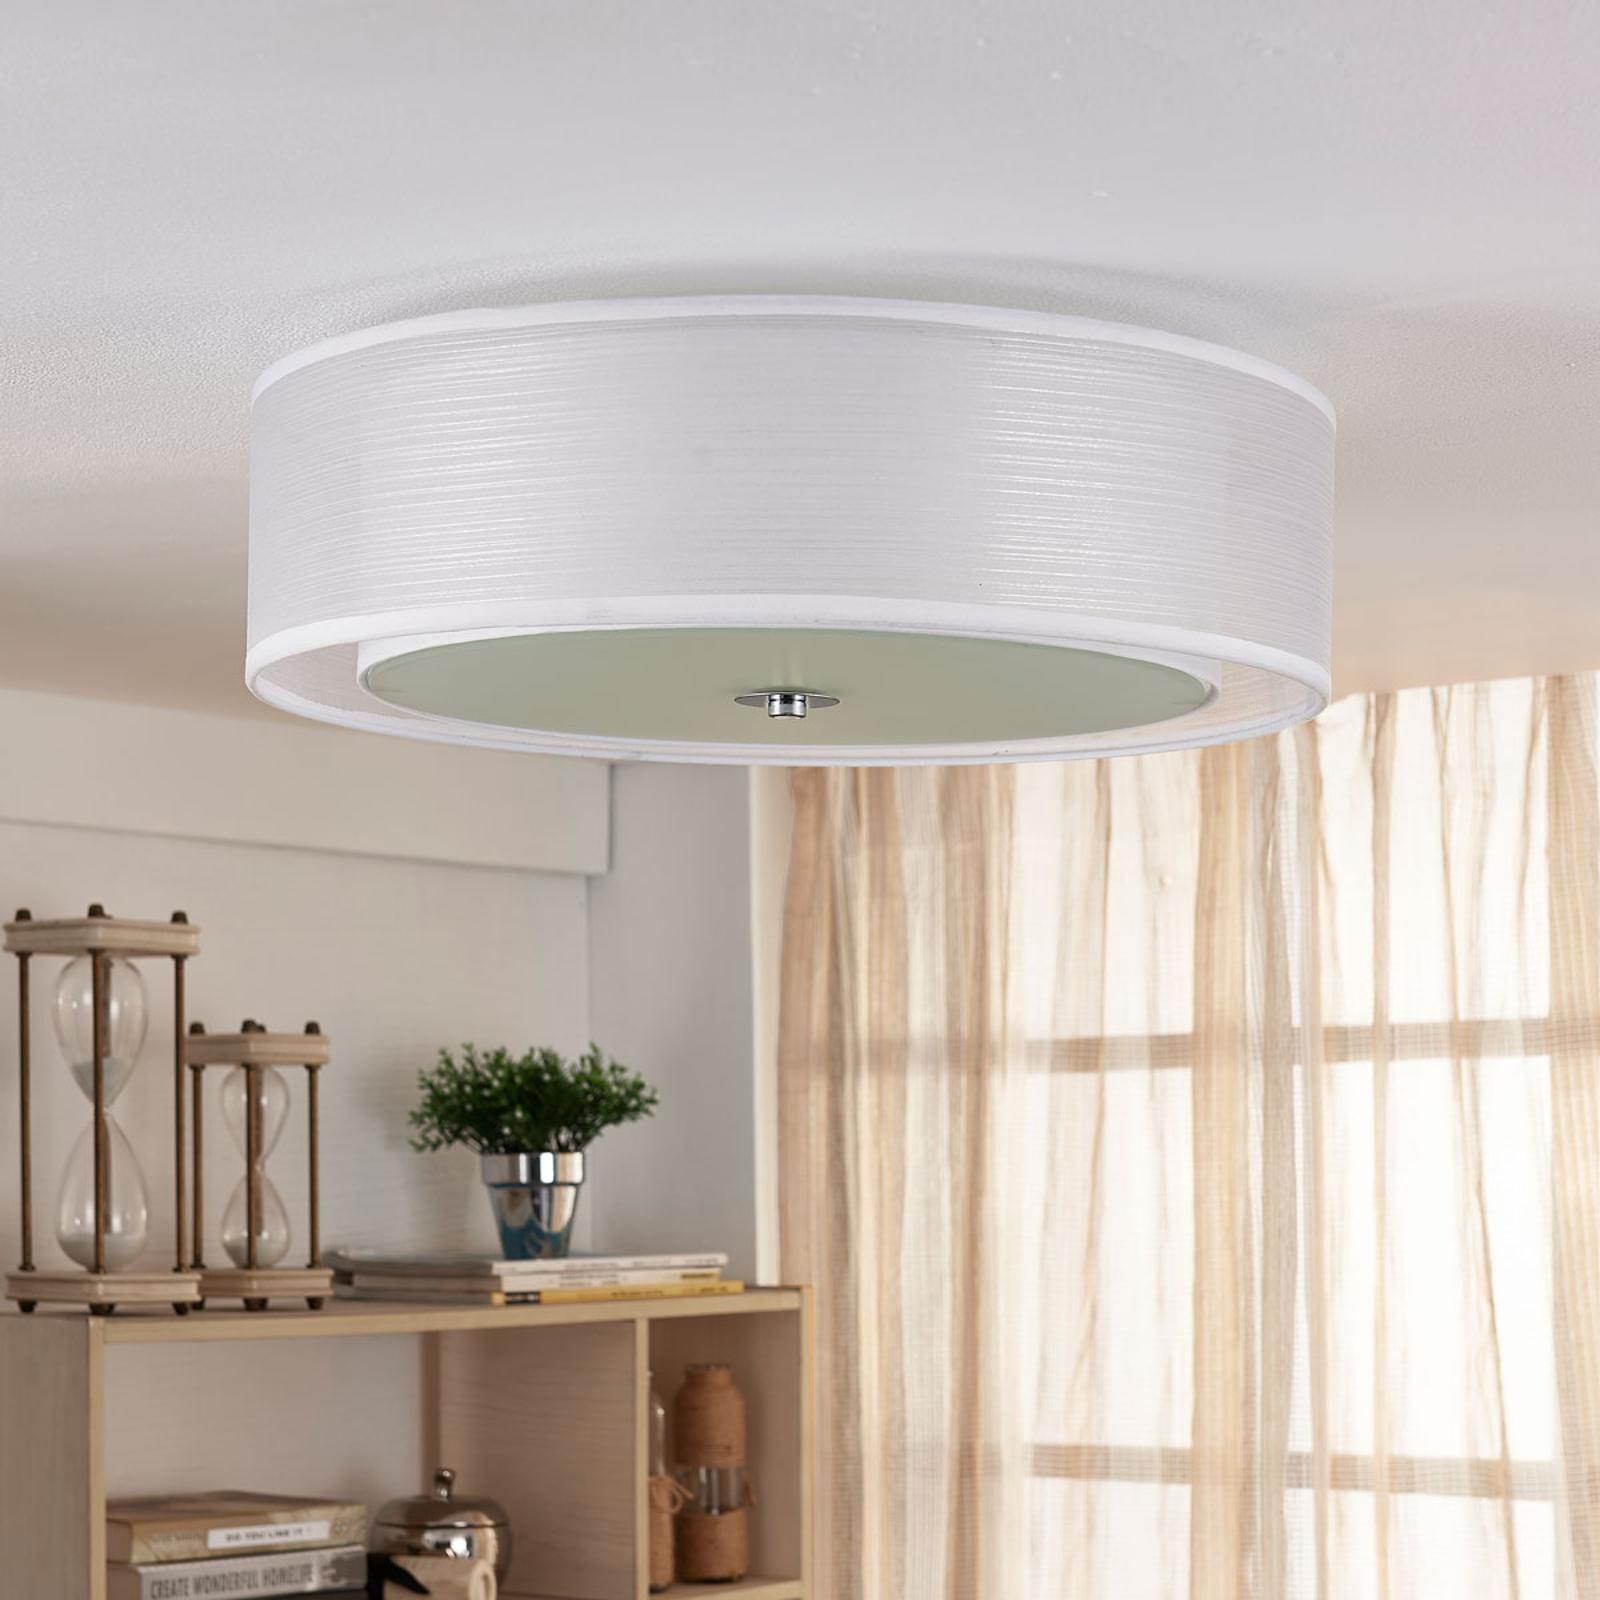 Tobia - easydim LED plafondlamp van wit stof